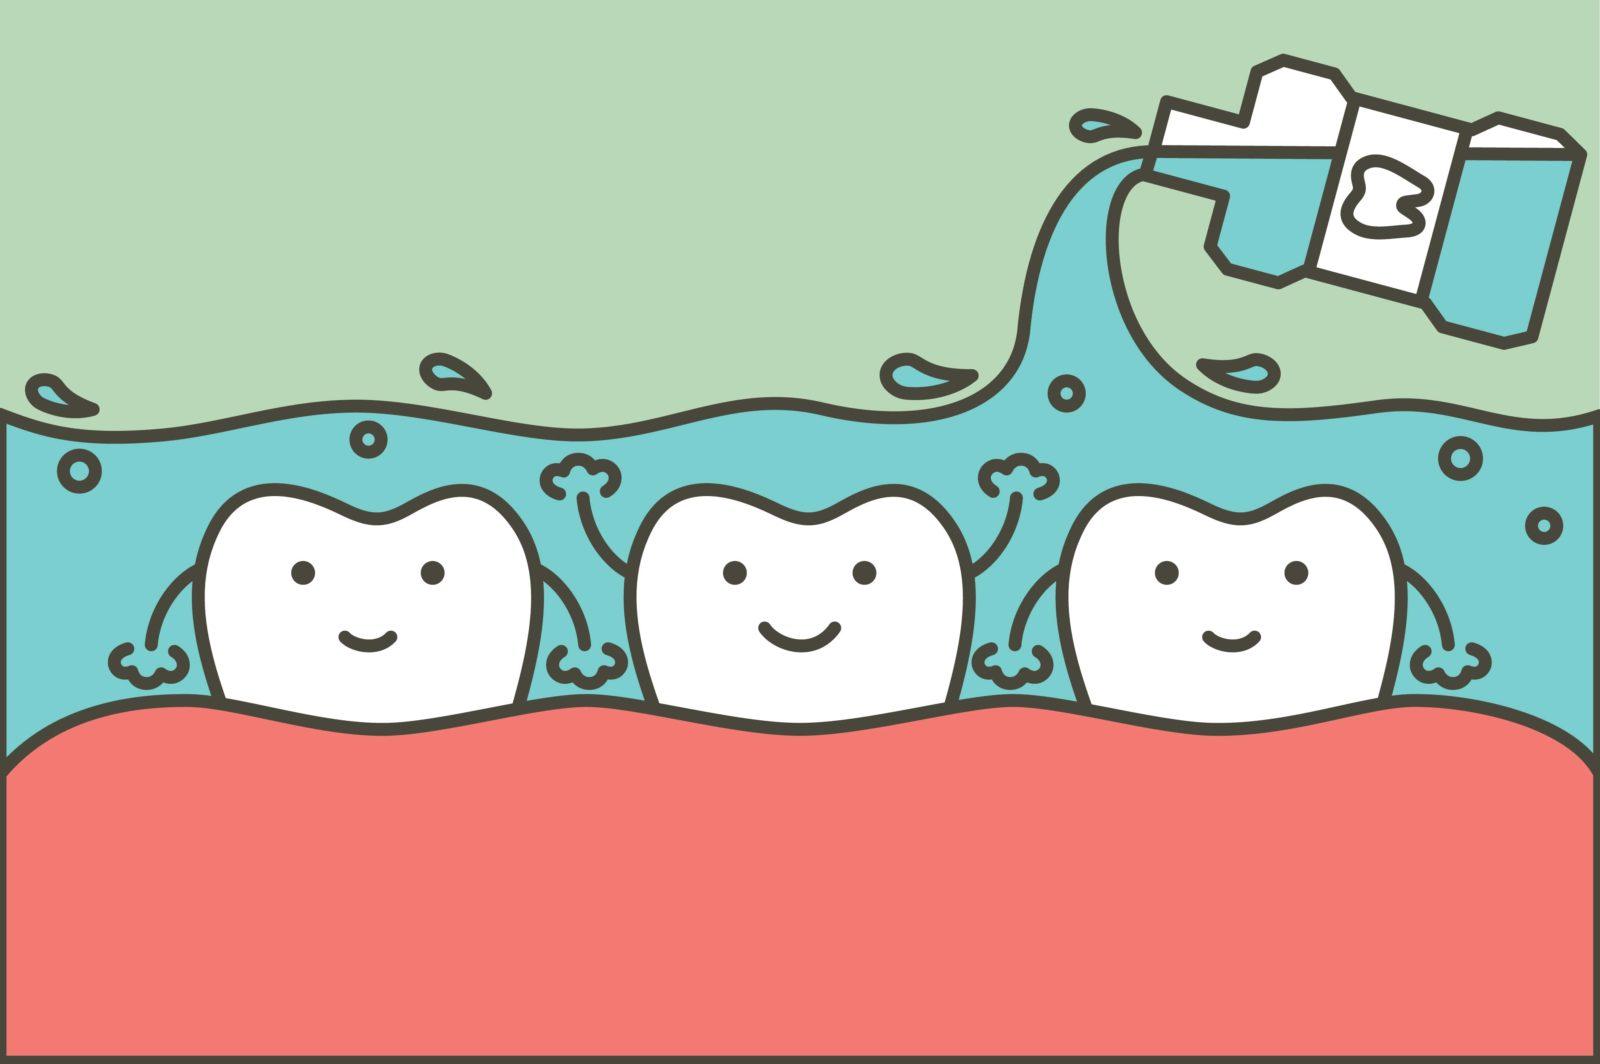 cartoon teeth being bathed in mouthwash